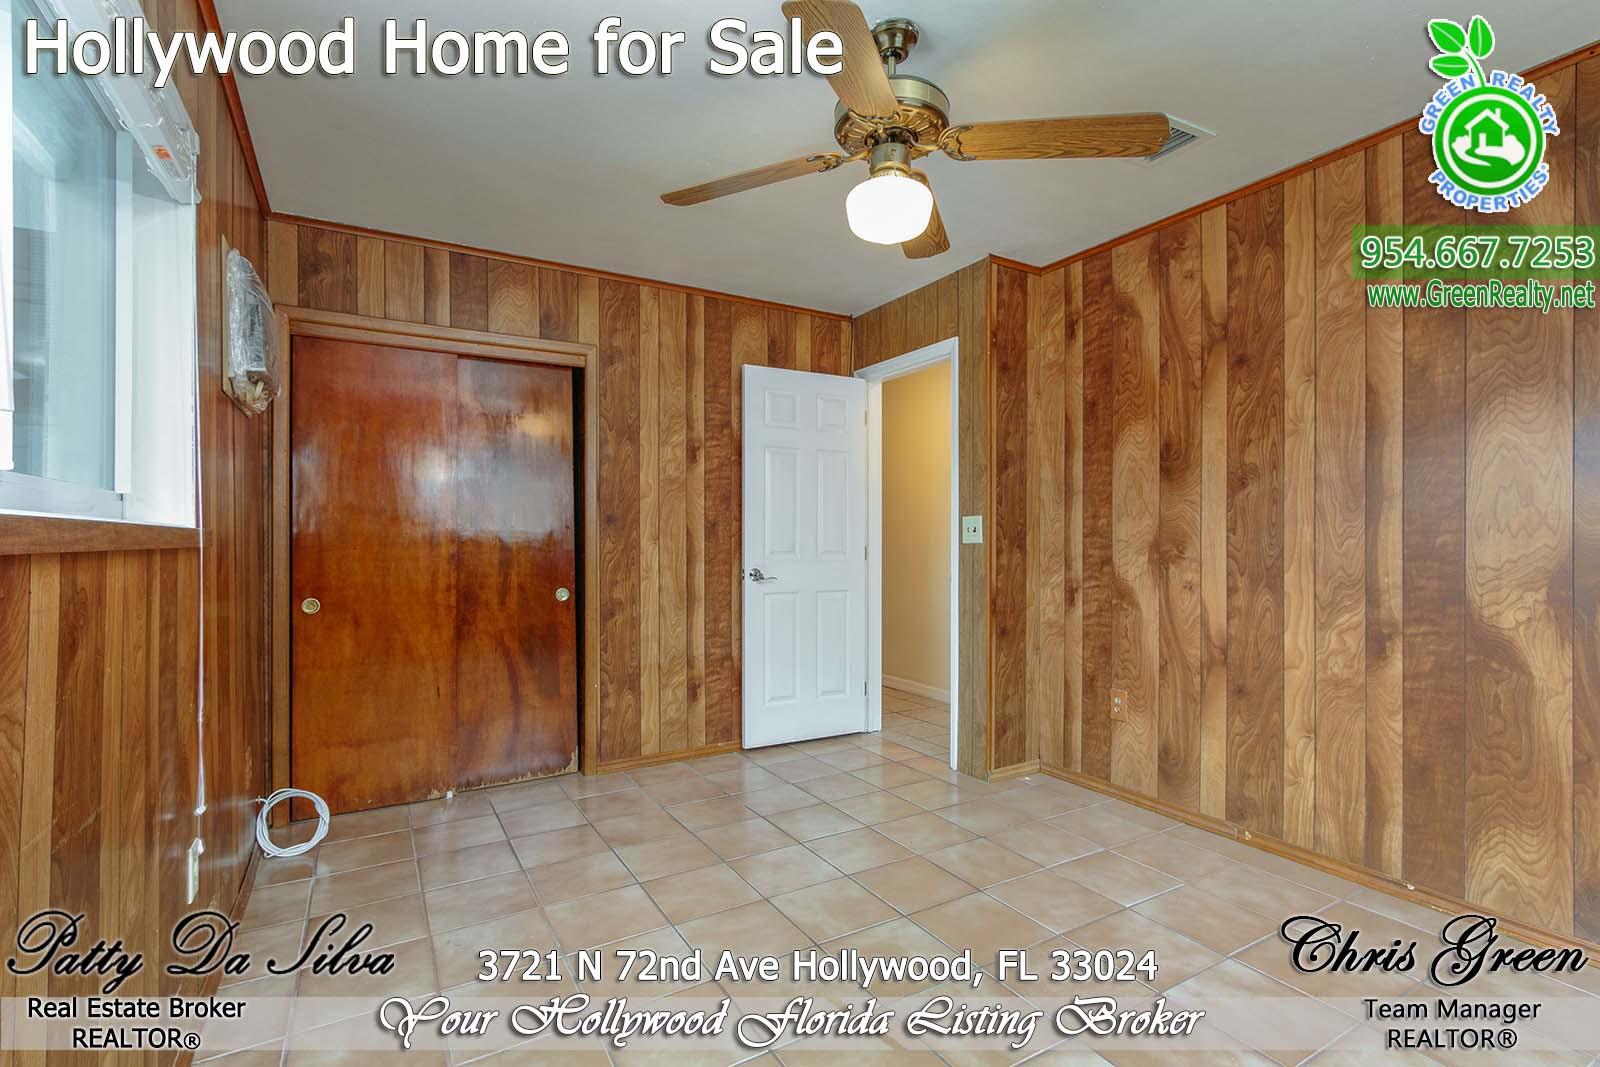 19 Hollywood Florida Real Estate Listing Patty Da Silva Green Realty properties (18)